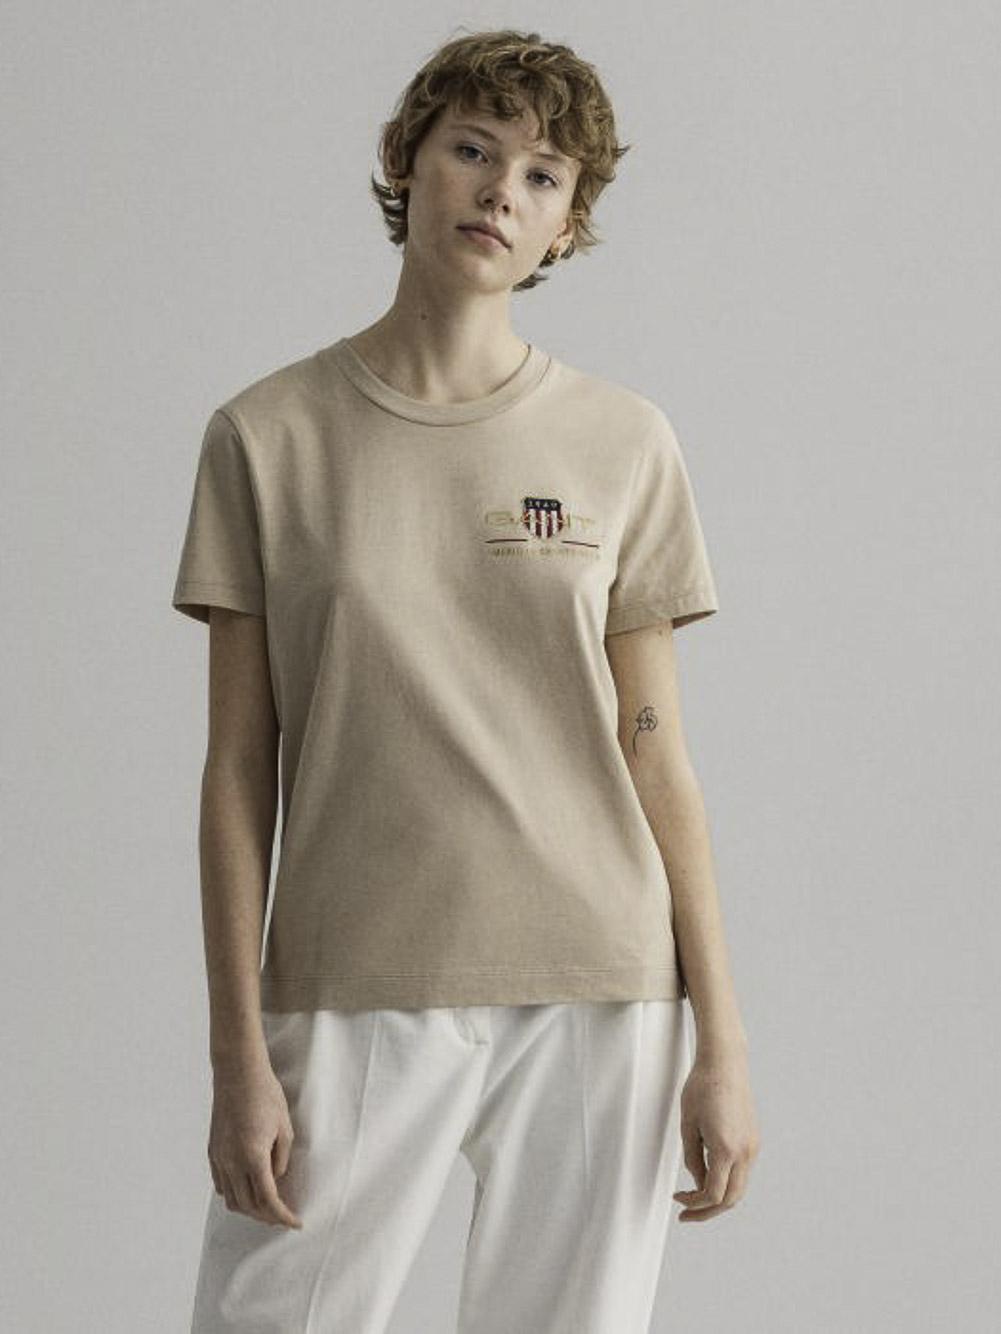 GANT Μπλούζα t-shirt 3GW4200417-277 ΜΠΕΖ